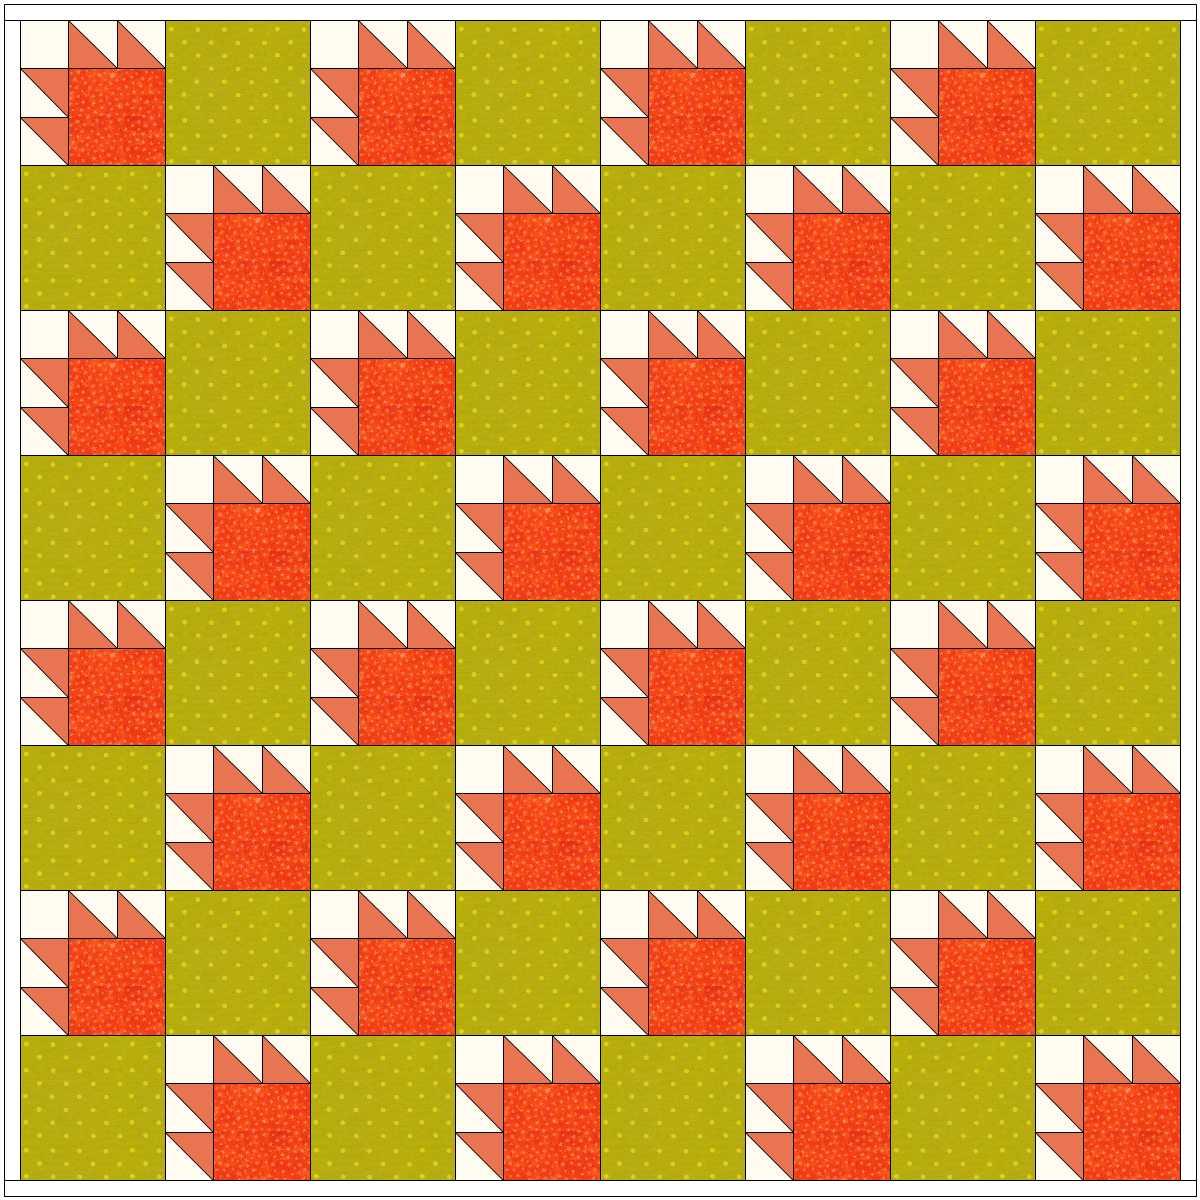 Bear Paws Alternating Blocks.jpg